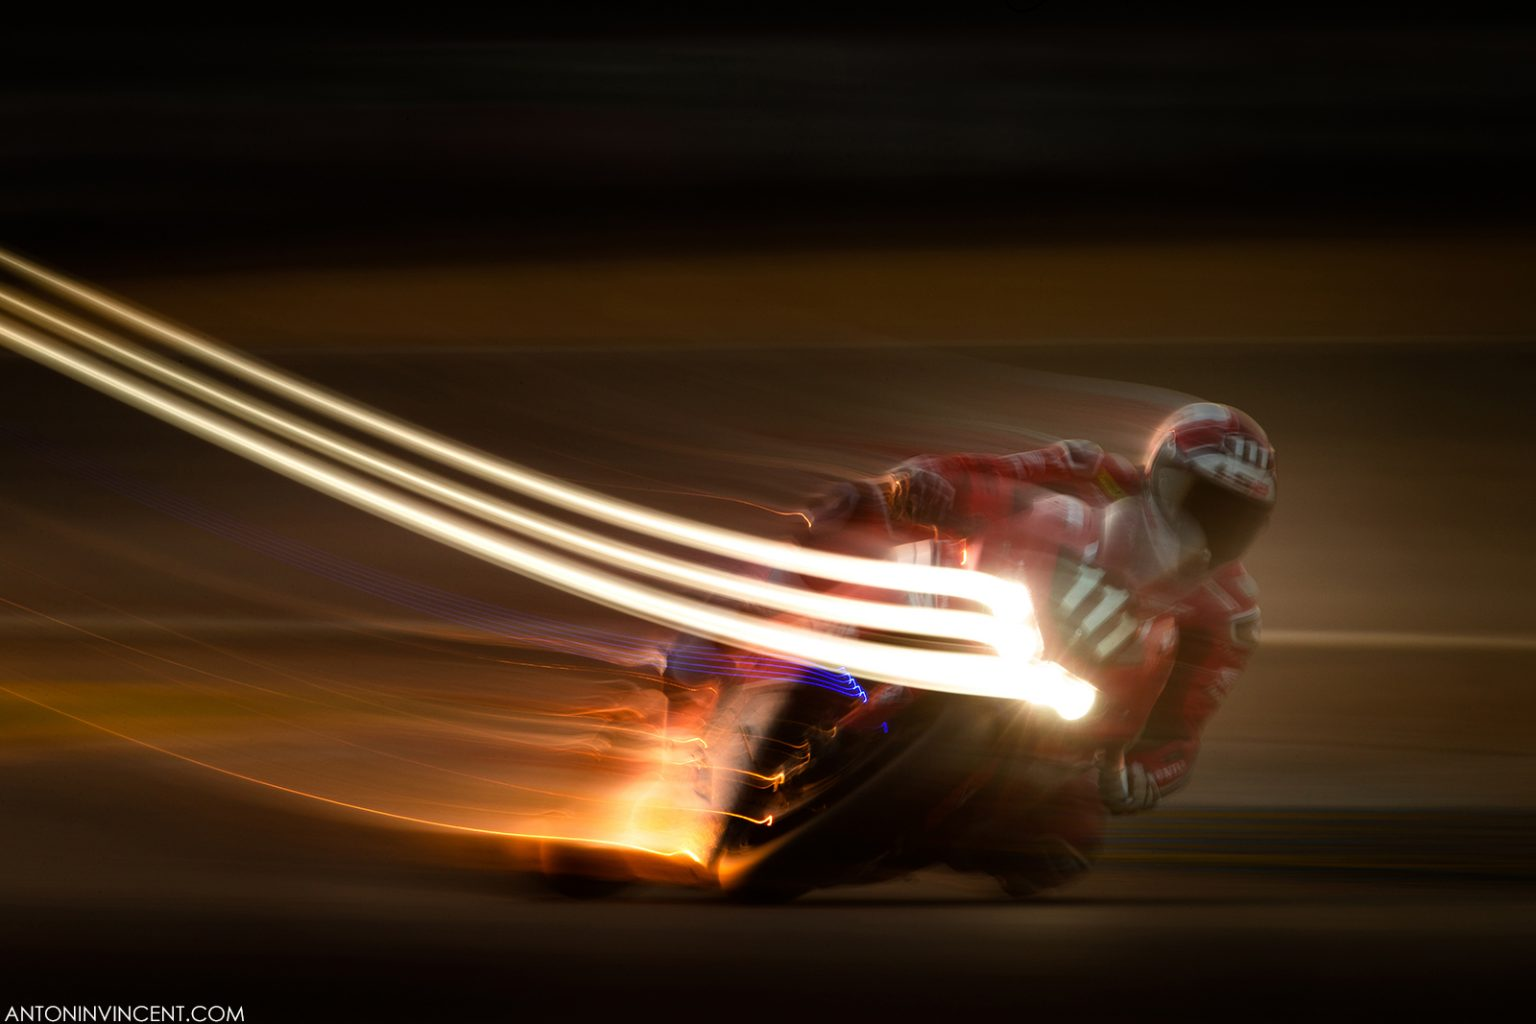 #111 Honda Endurance Racing (GBR) BIKE : Honda CB R1000 RR CATEGORY : EWC RIDERS : GIMBERT Sebastien (FRA) HERNANDEZ Yonny (COL) DE PUNIET Randy * (FRA)